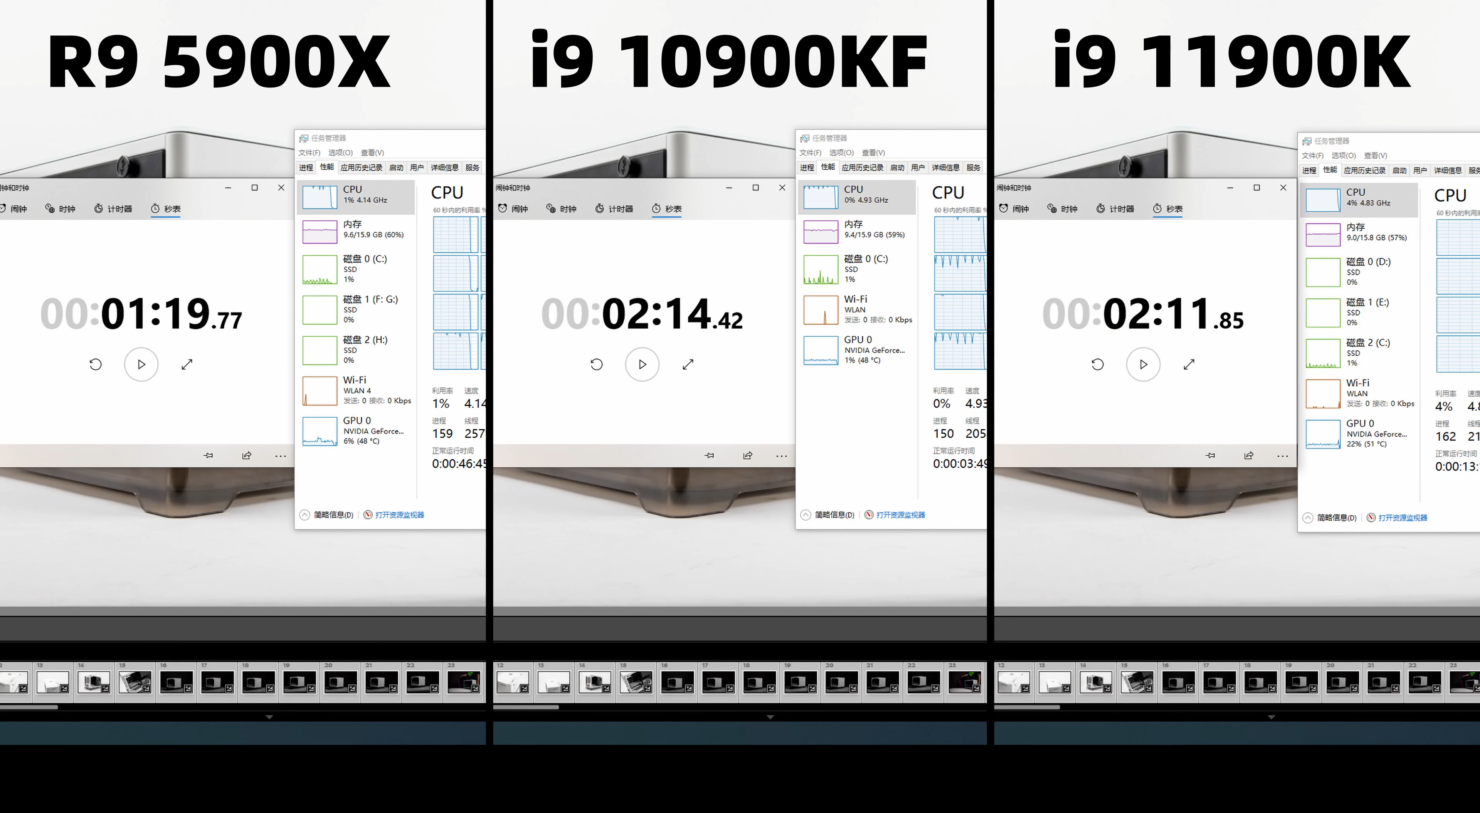 intel-core-i9-11900k-11th-gen-rocket-lake-desktop-cpu-benchmark-leak-_5